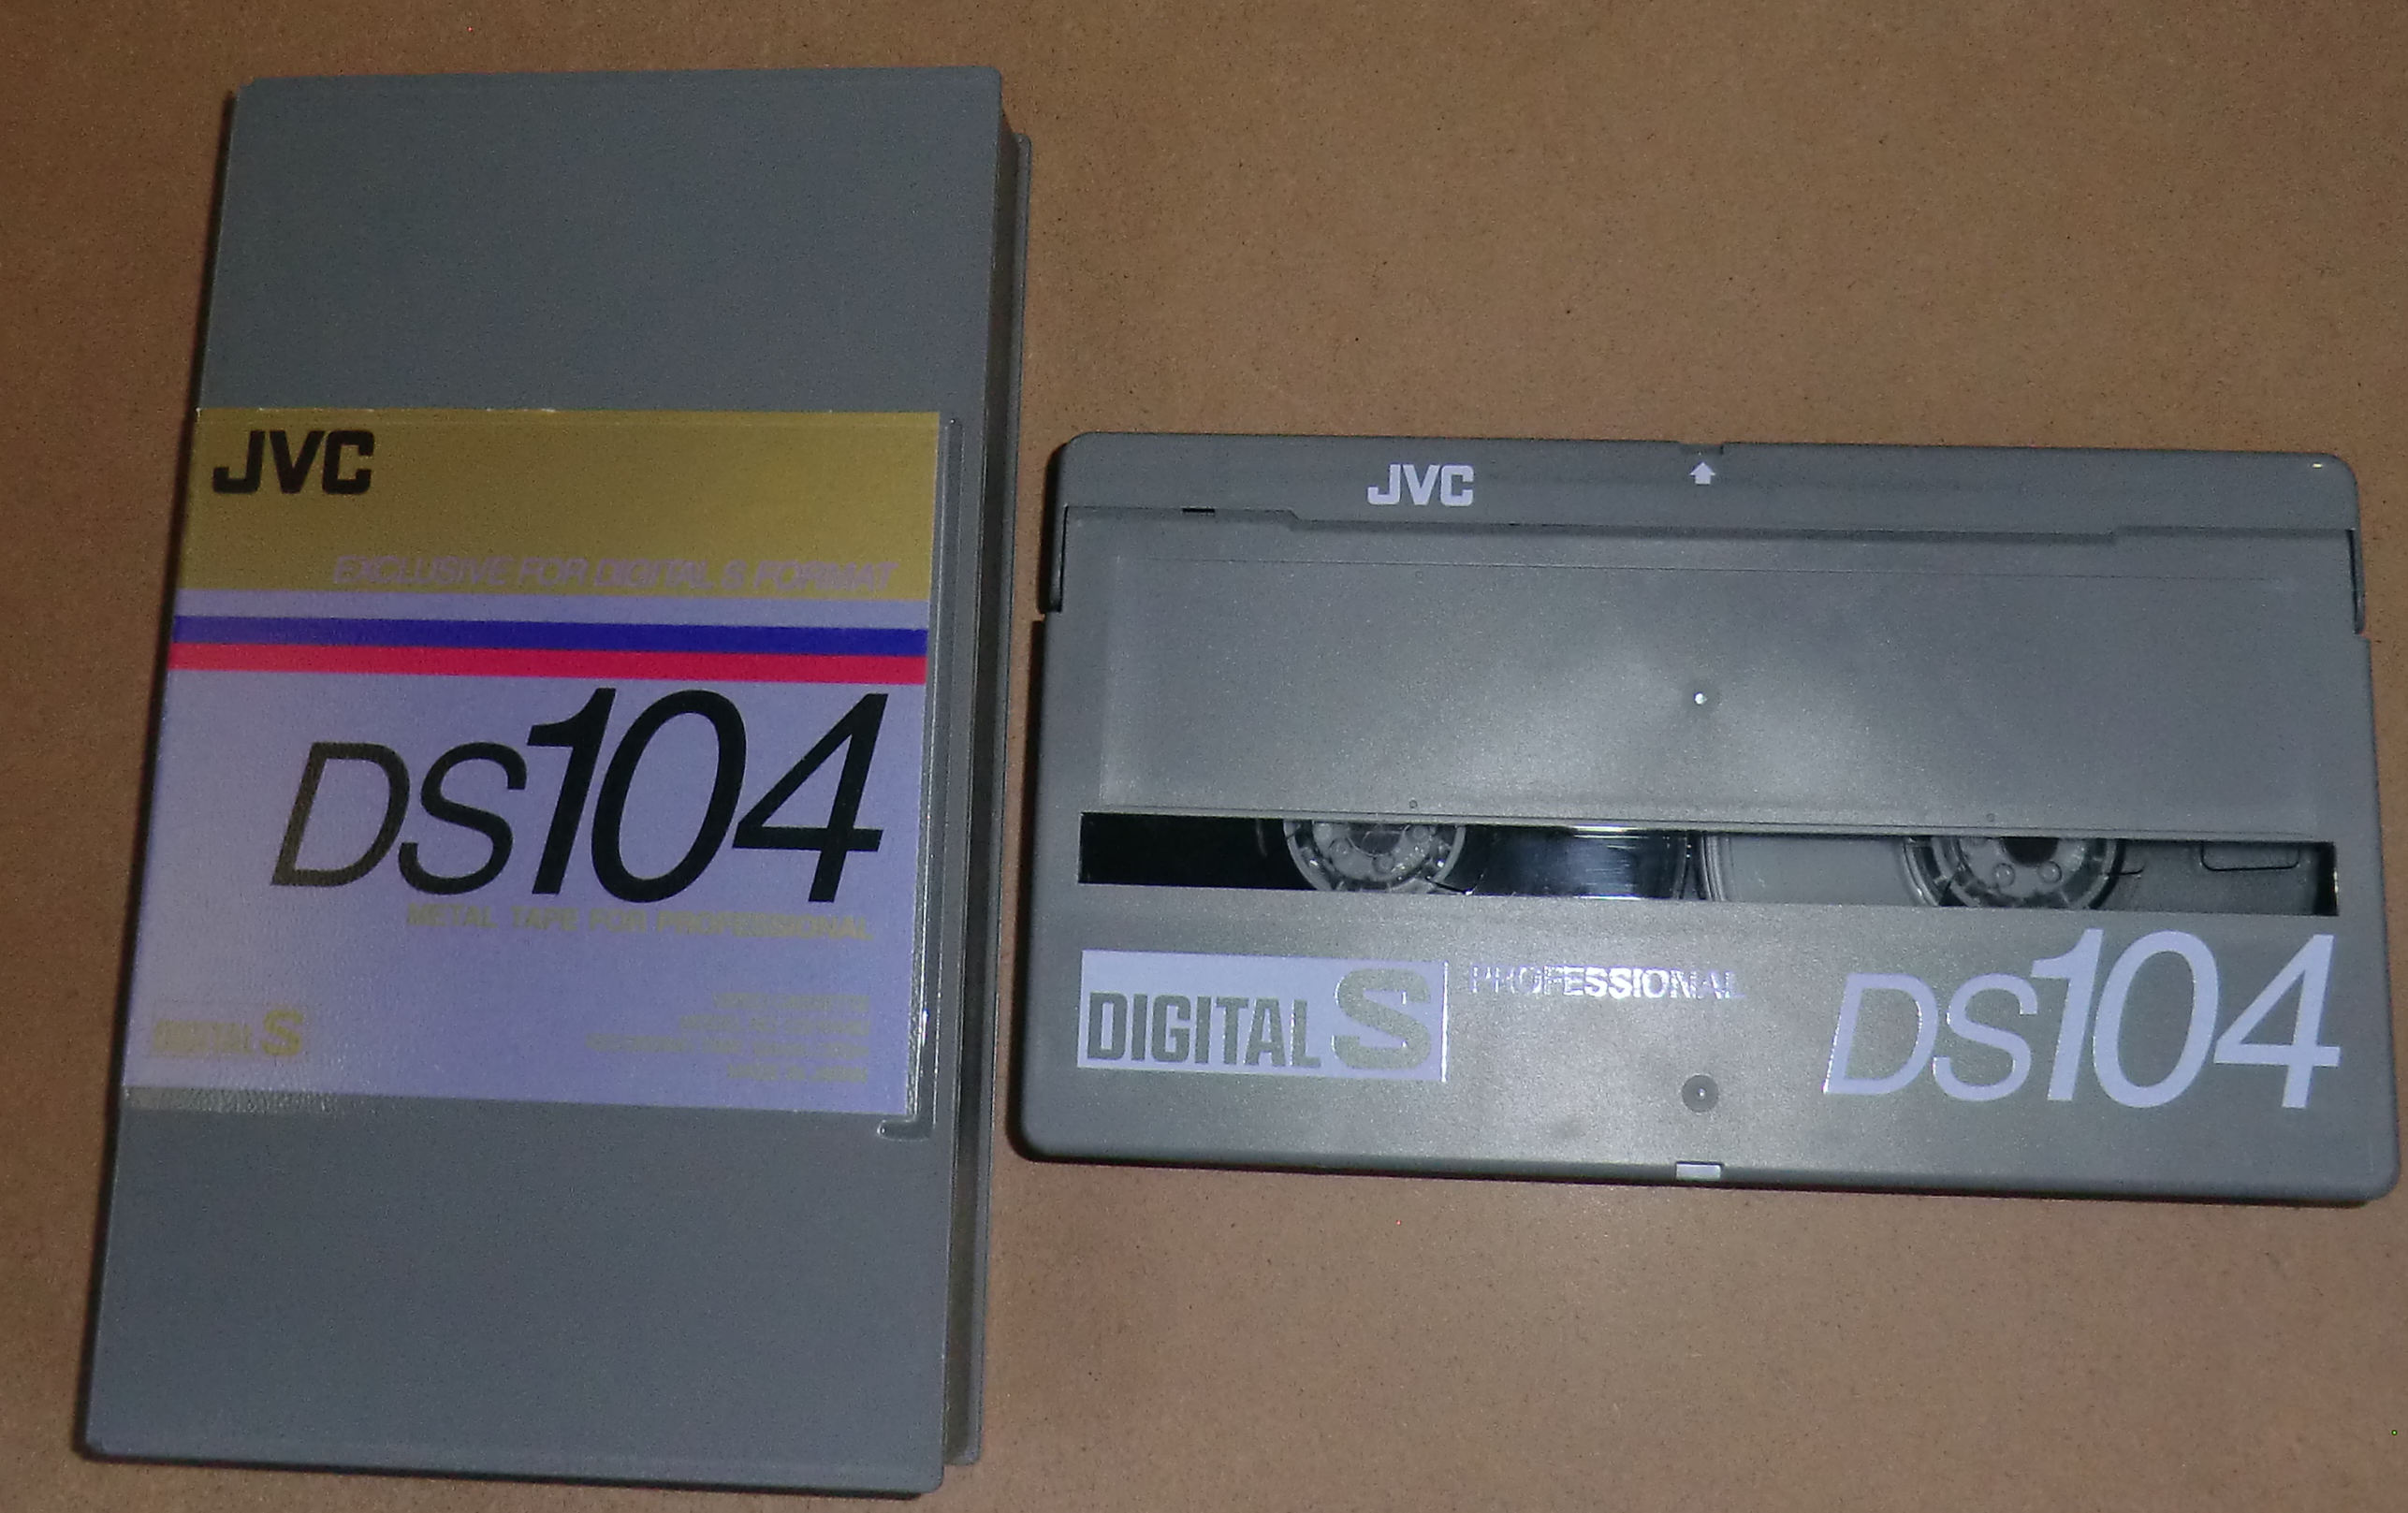 Digital S